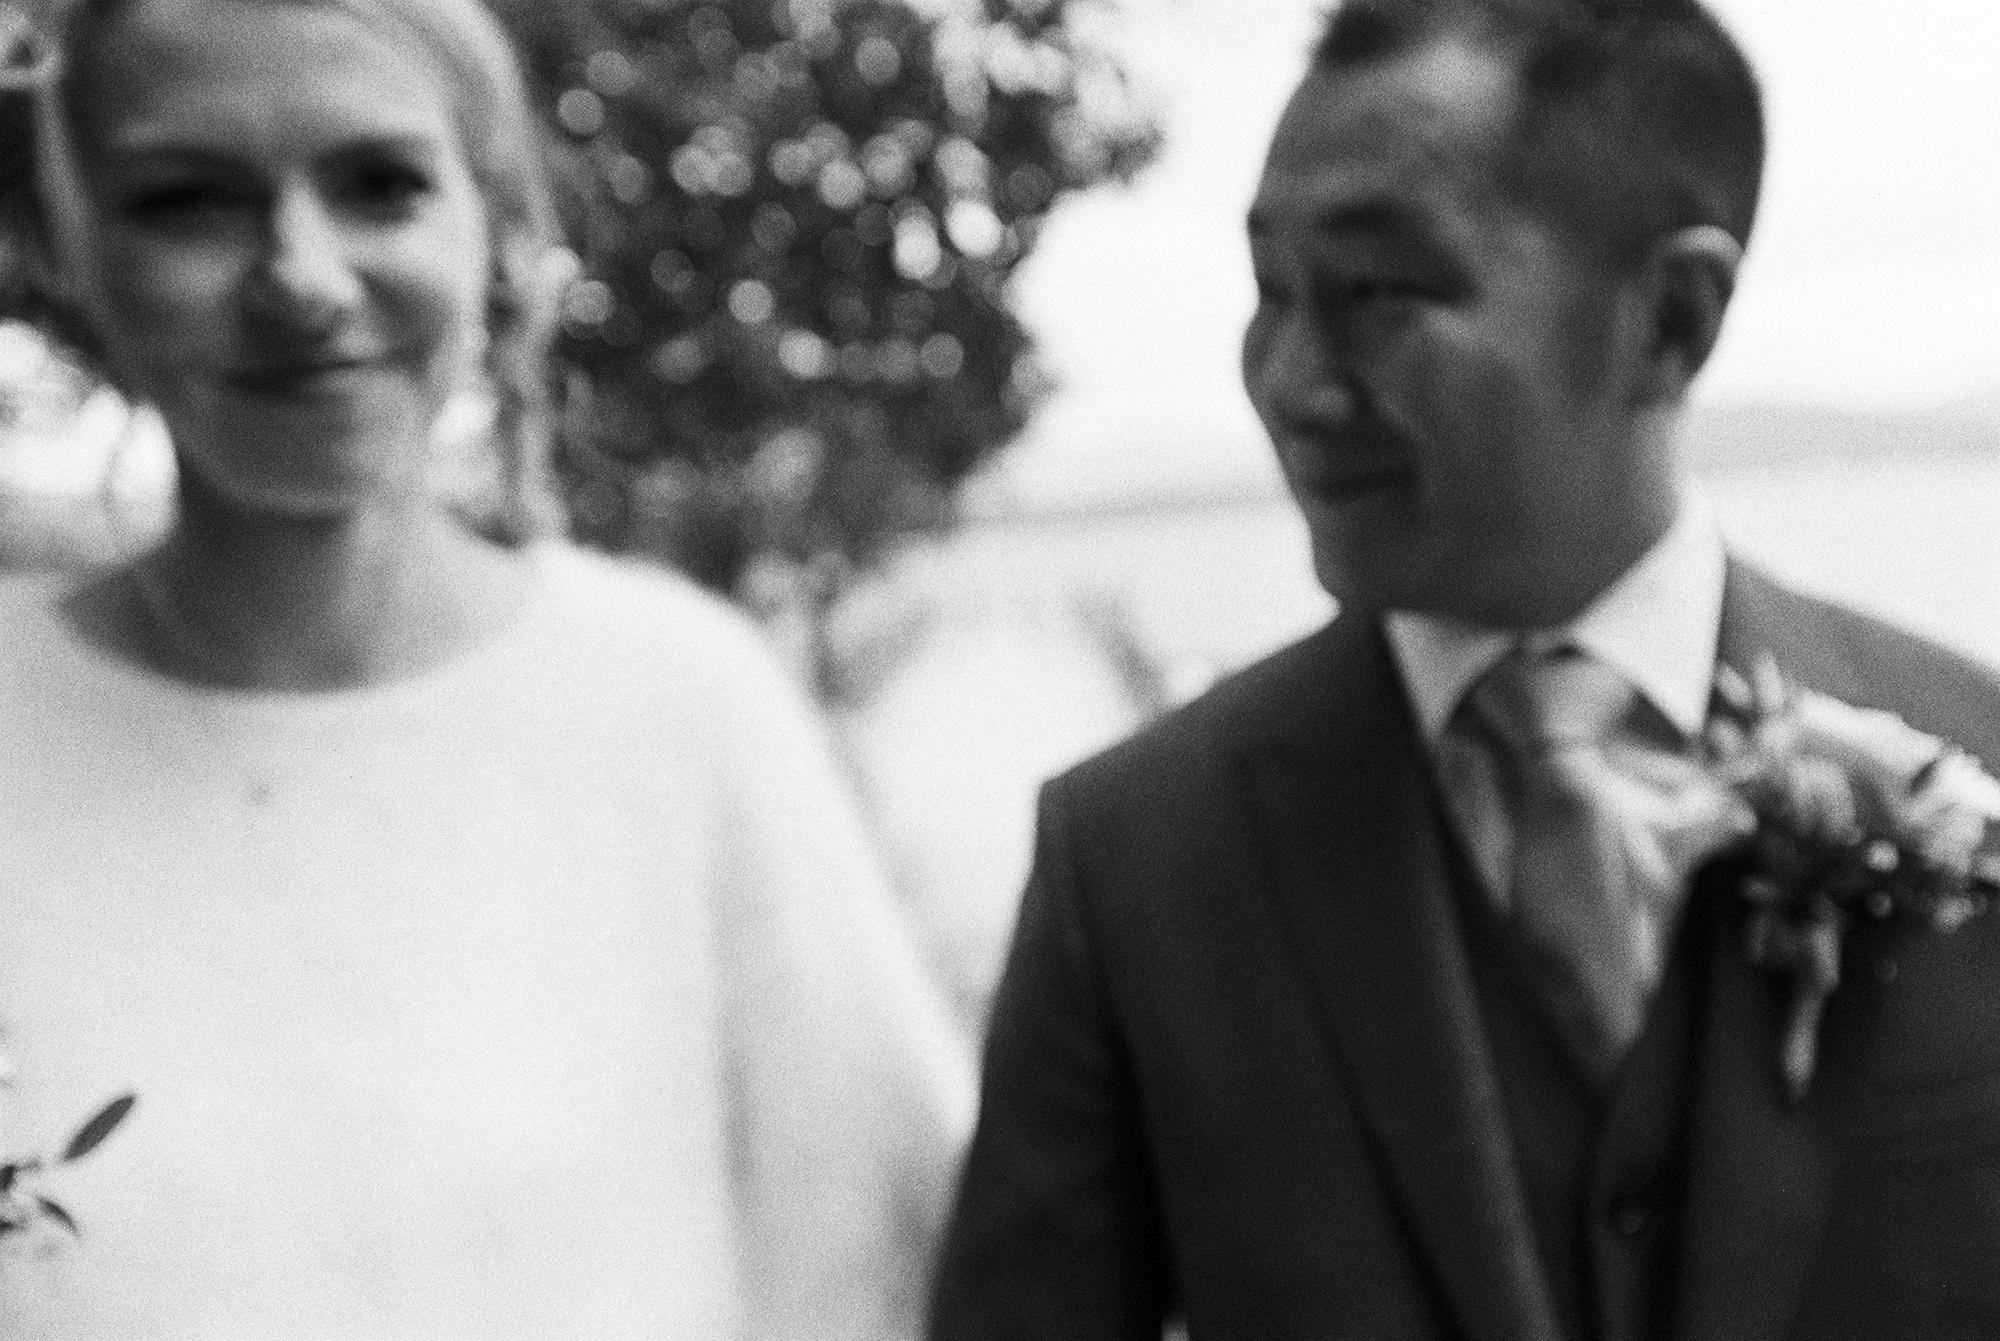 wedding_photographer_cumbria038.jpg